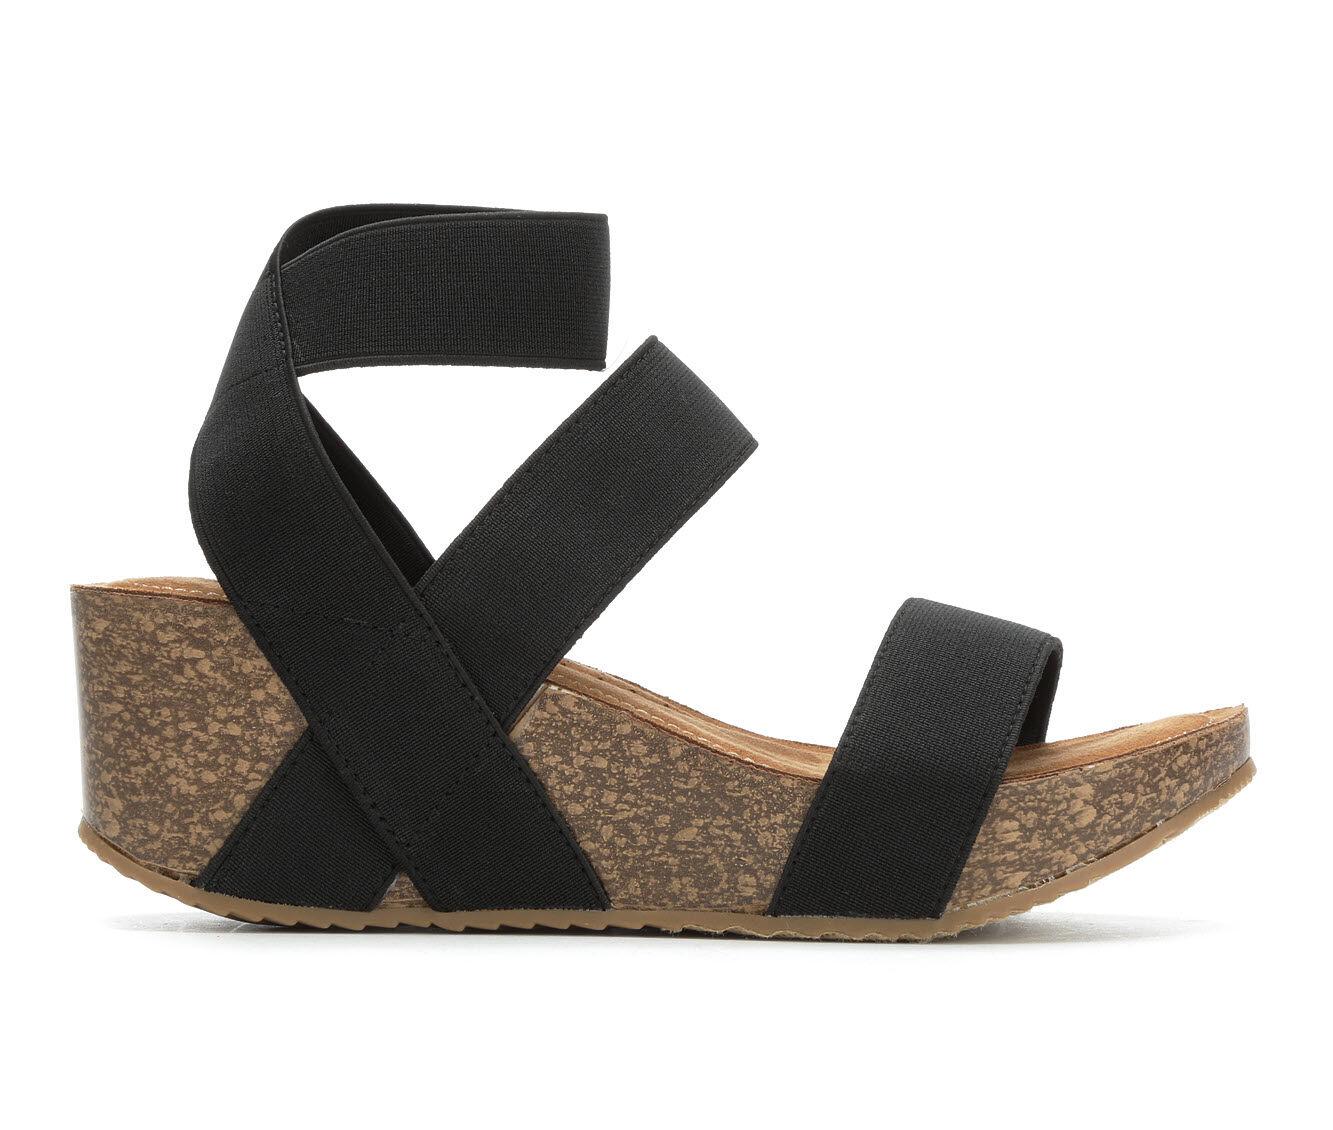 uk shoes_kd6588